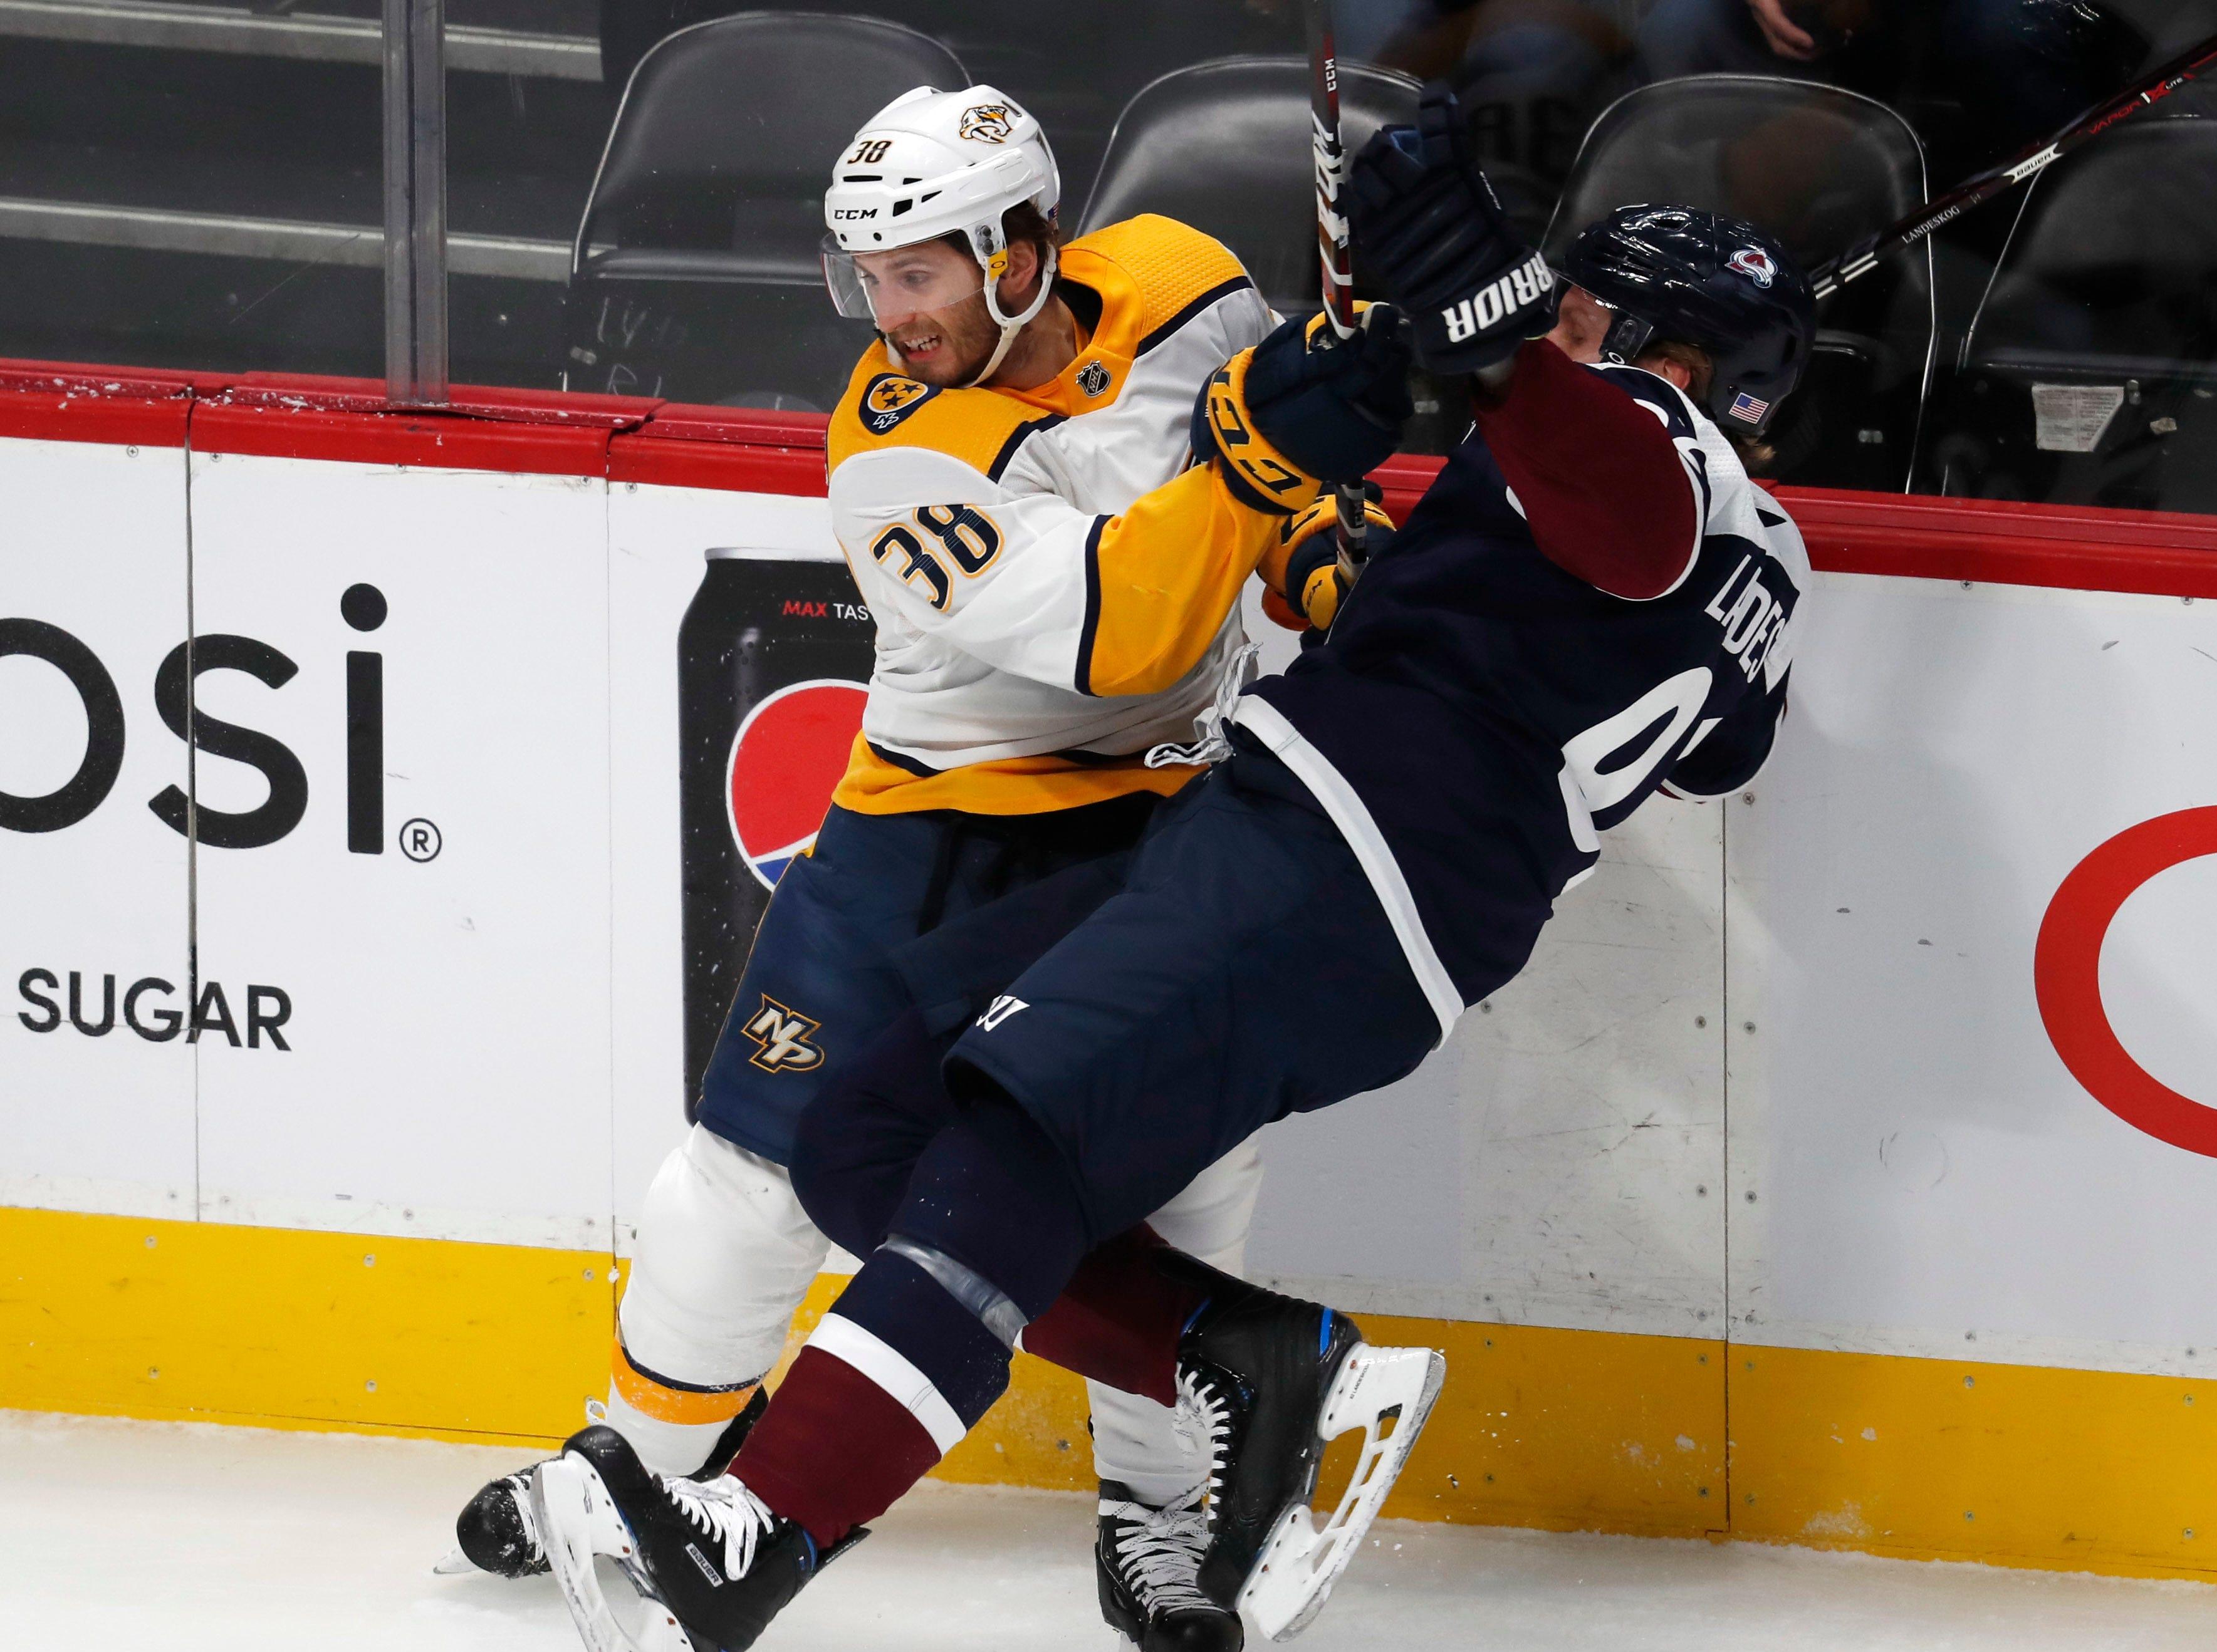 Nashville Predators right wing Ryan Hartman, left, checks Colorado Avalanche left wing Gabriel Landeskog in the first period of an NHL hockey game Wednesday, Nov. 7, 2018, in Denver.